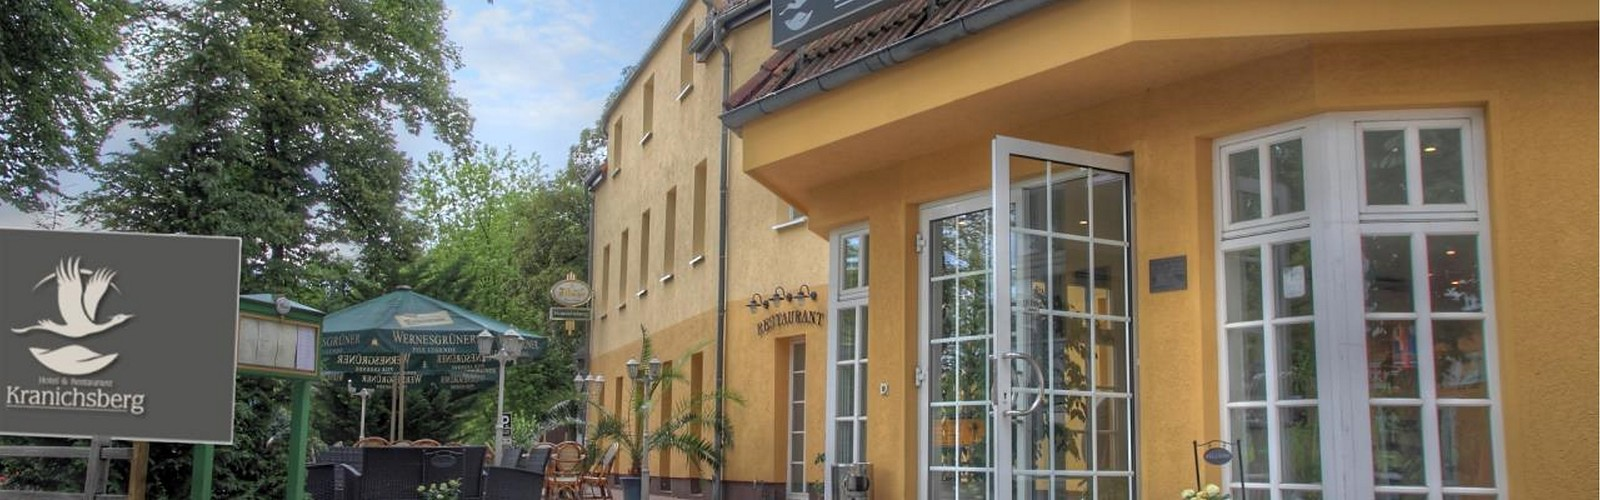 Eingang, Foto: Hotel & Restaurant Kranichsberg